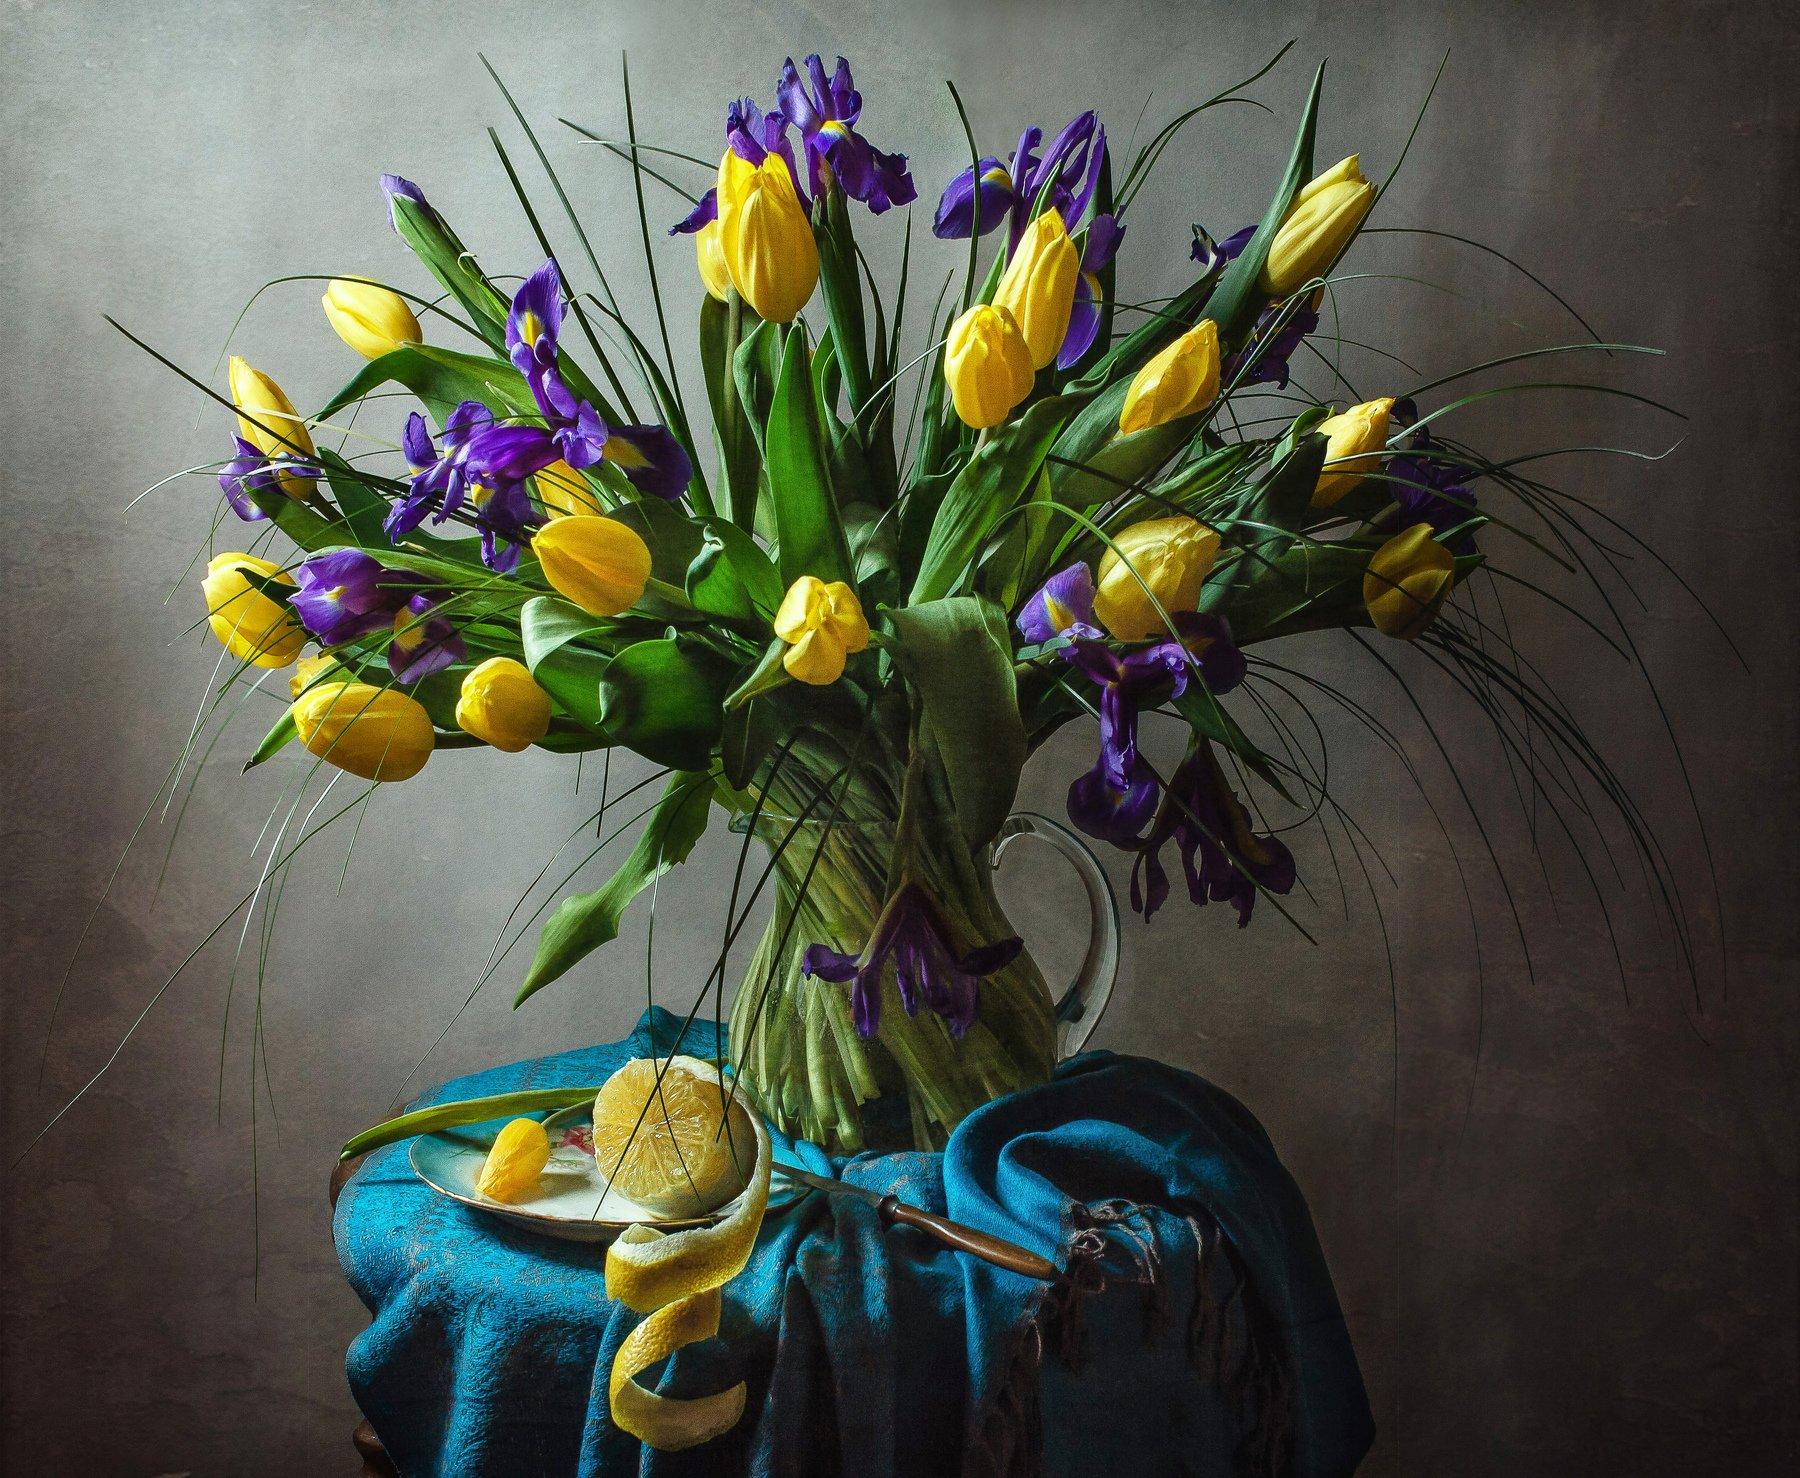 натюрморт, стекло, кувшин, цветы, ирисы, тюльпаны, лимон, Анна Петина